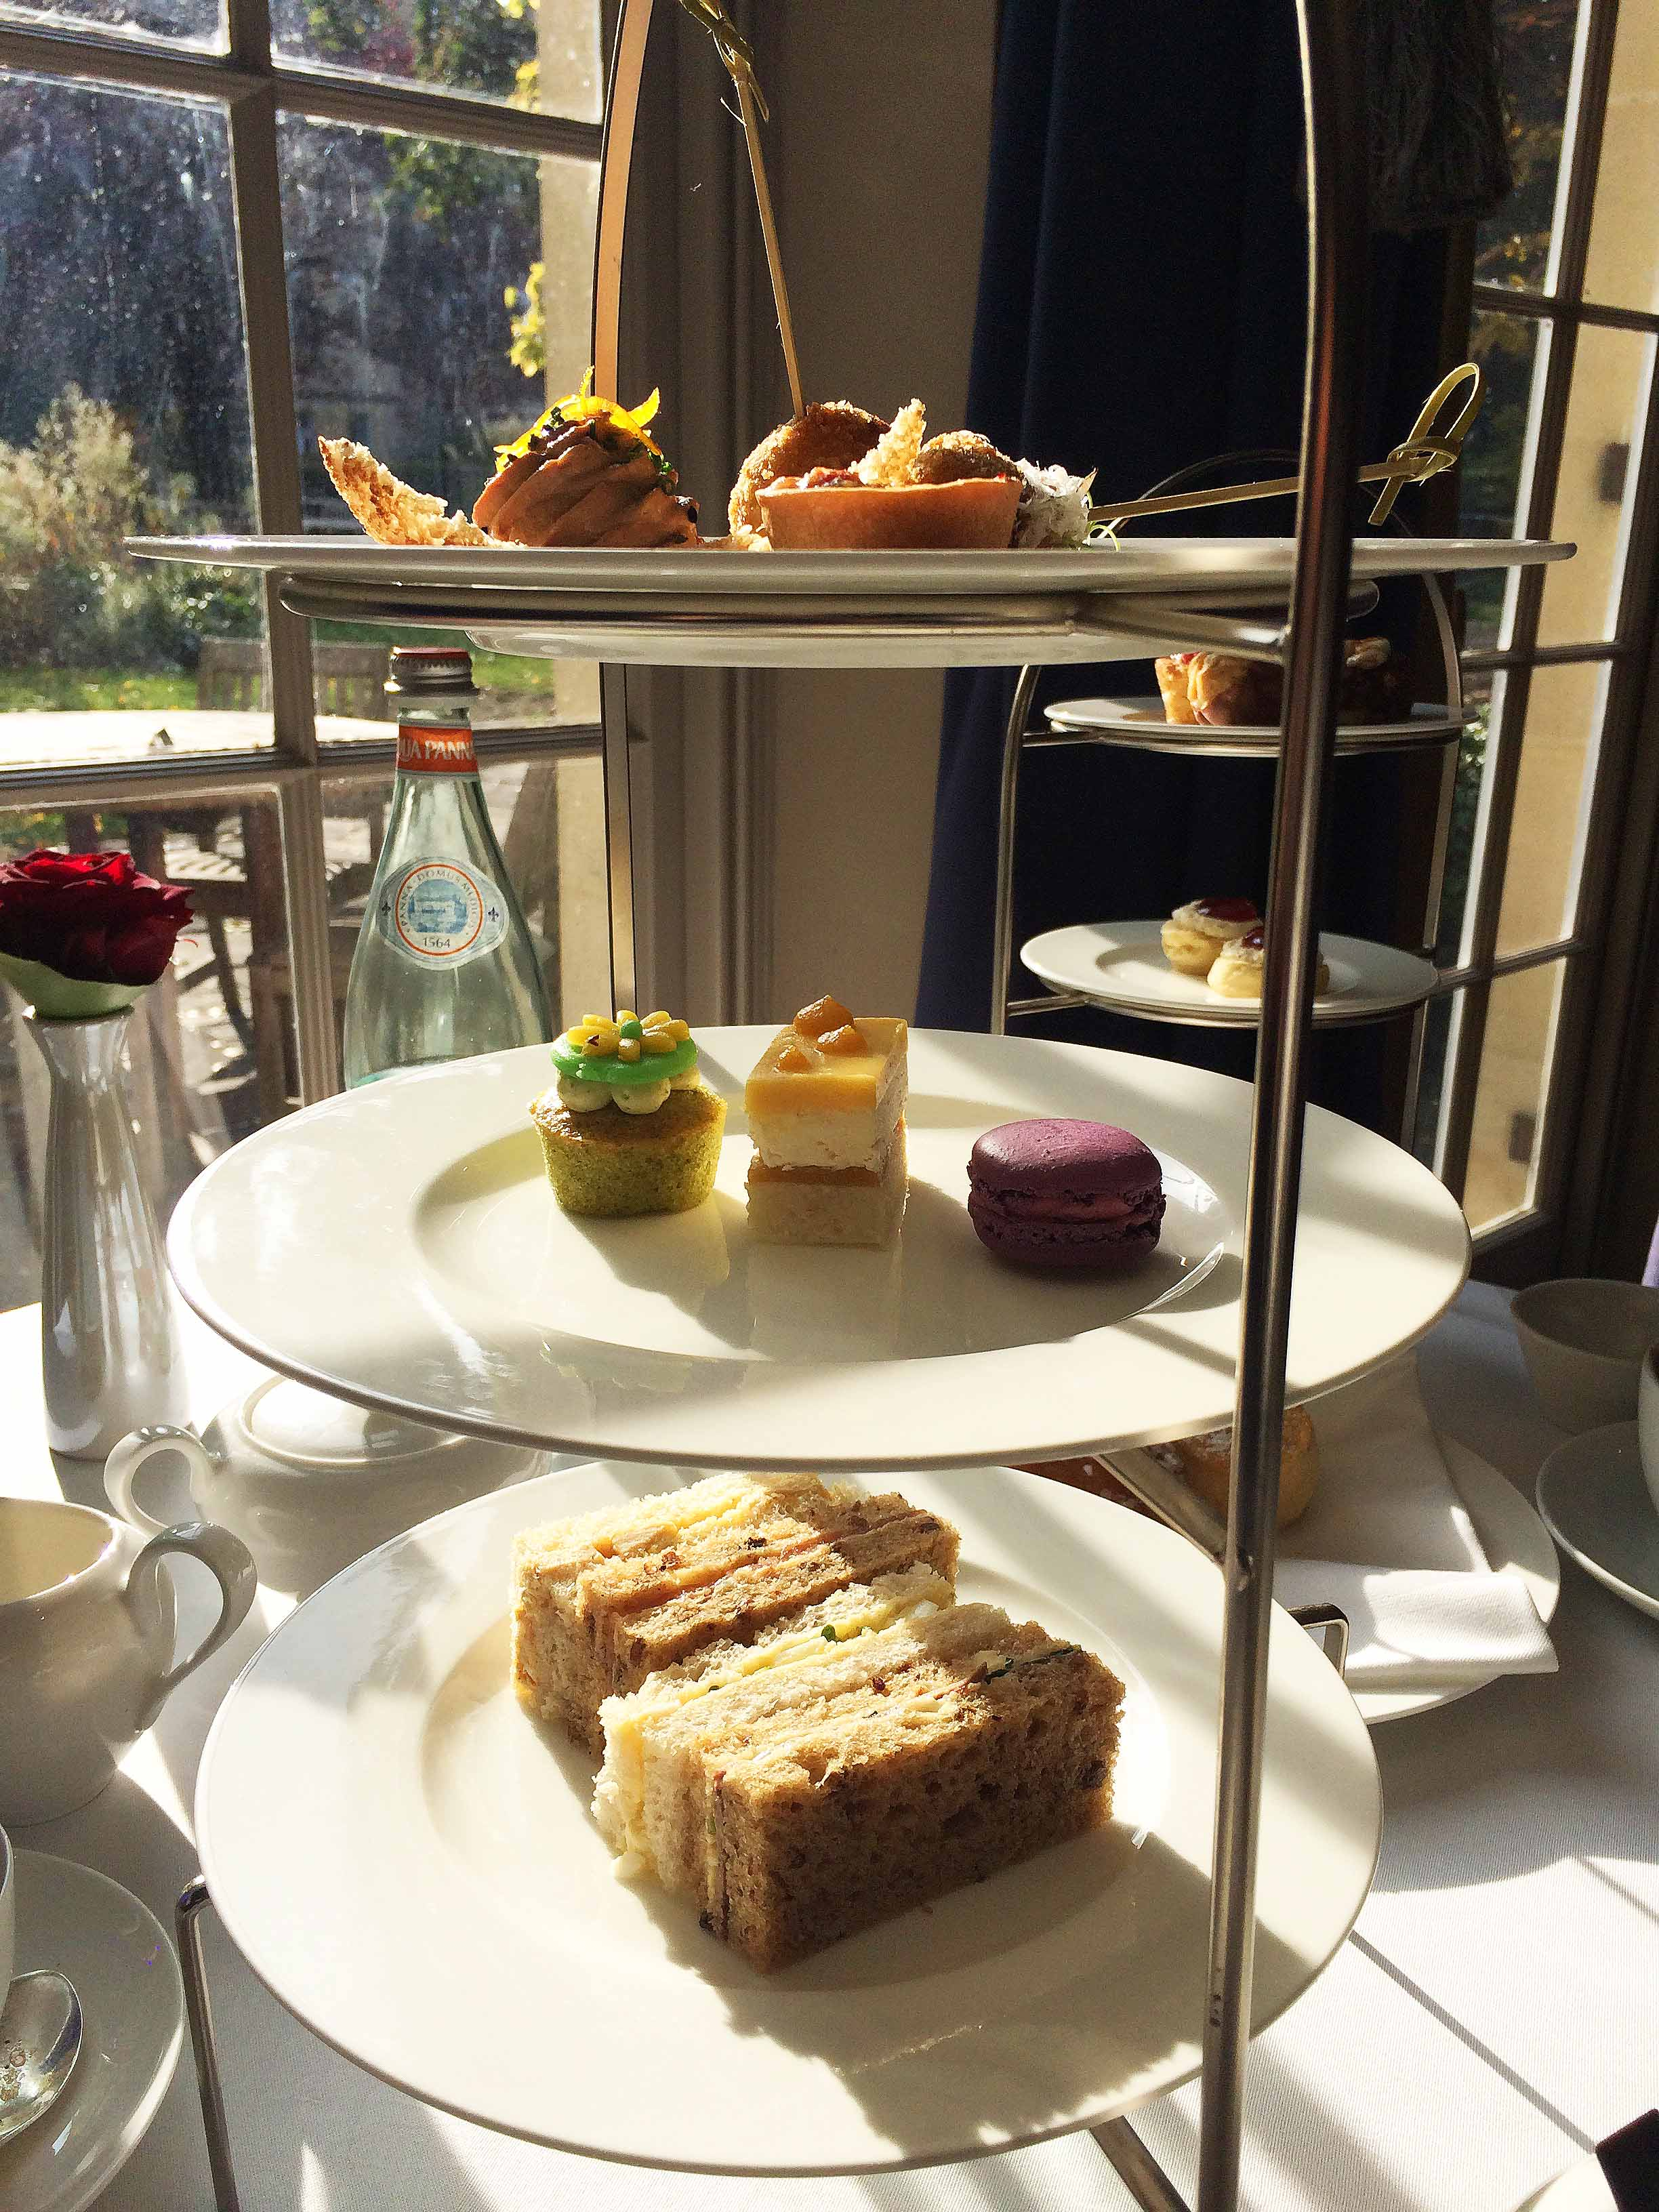 Afternoon tea at Royal Crescent Hotel, Bath